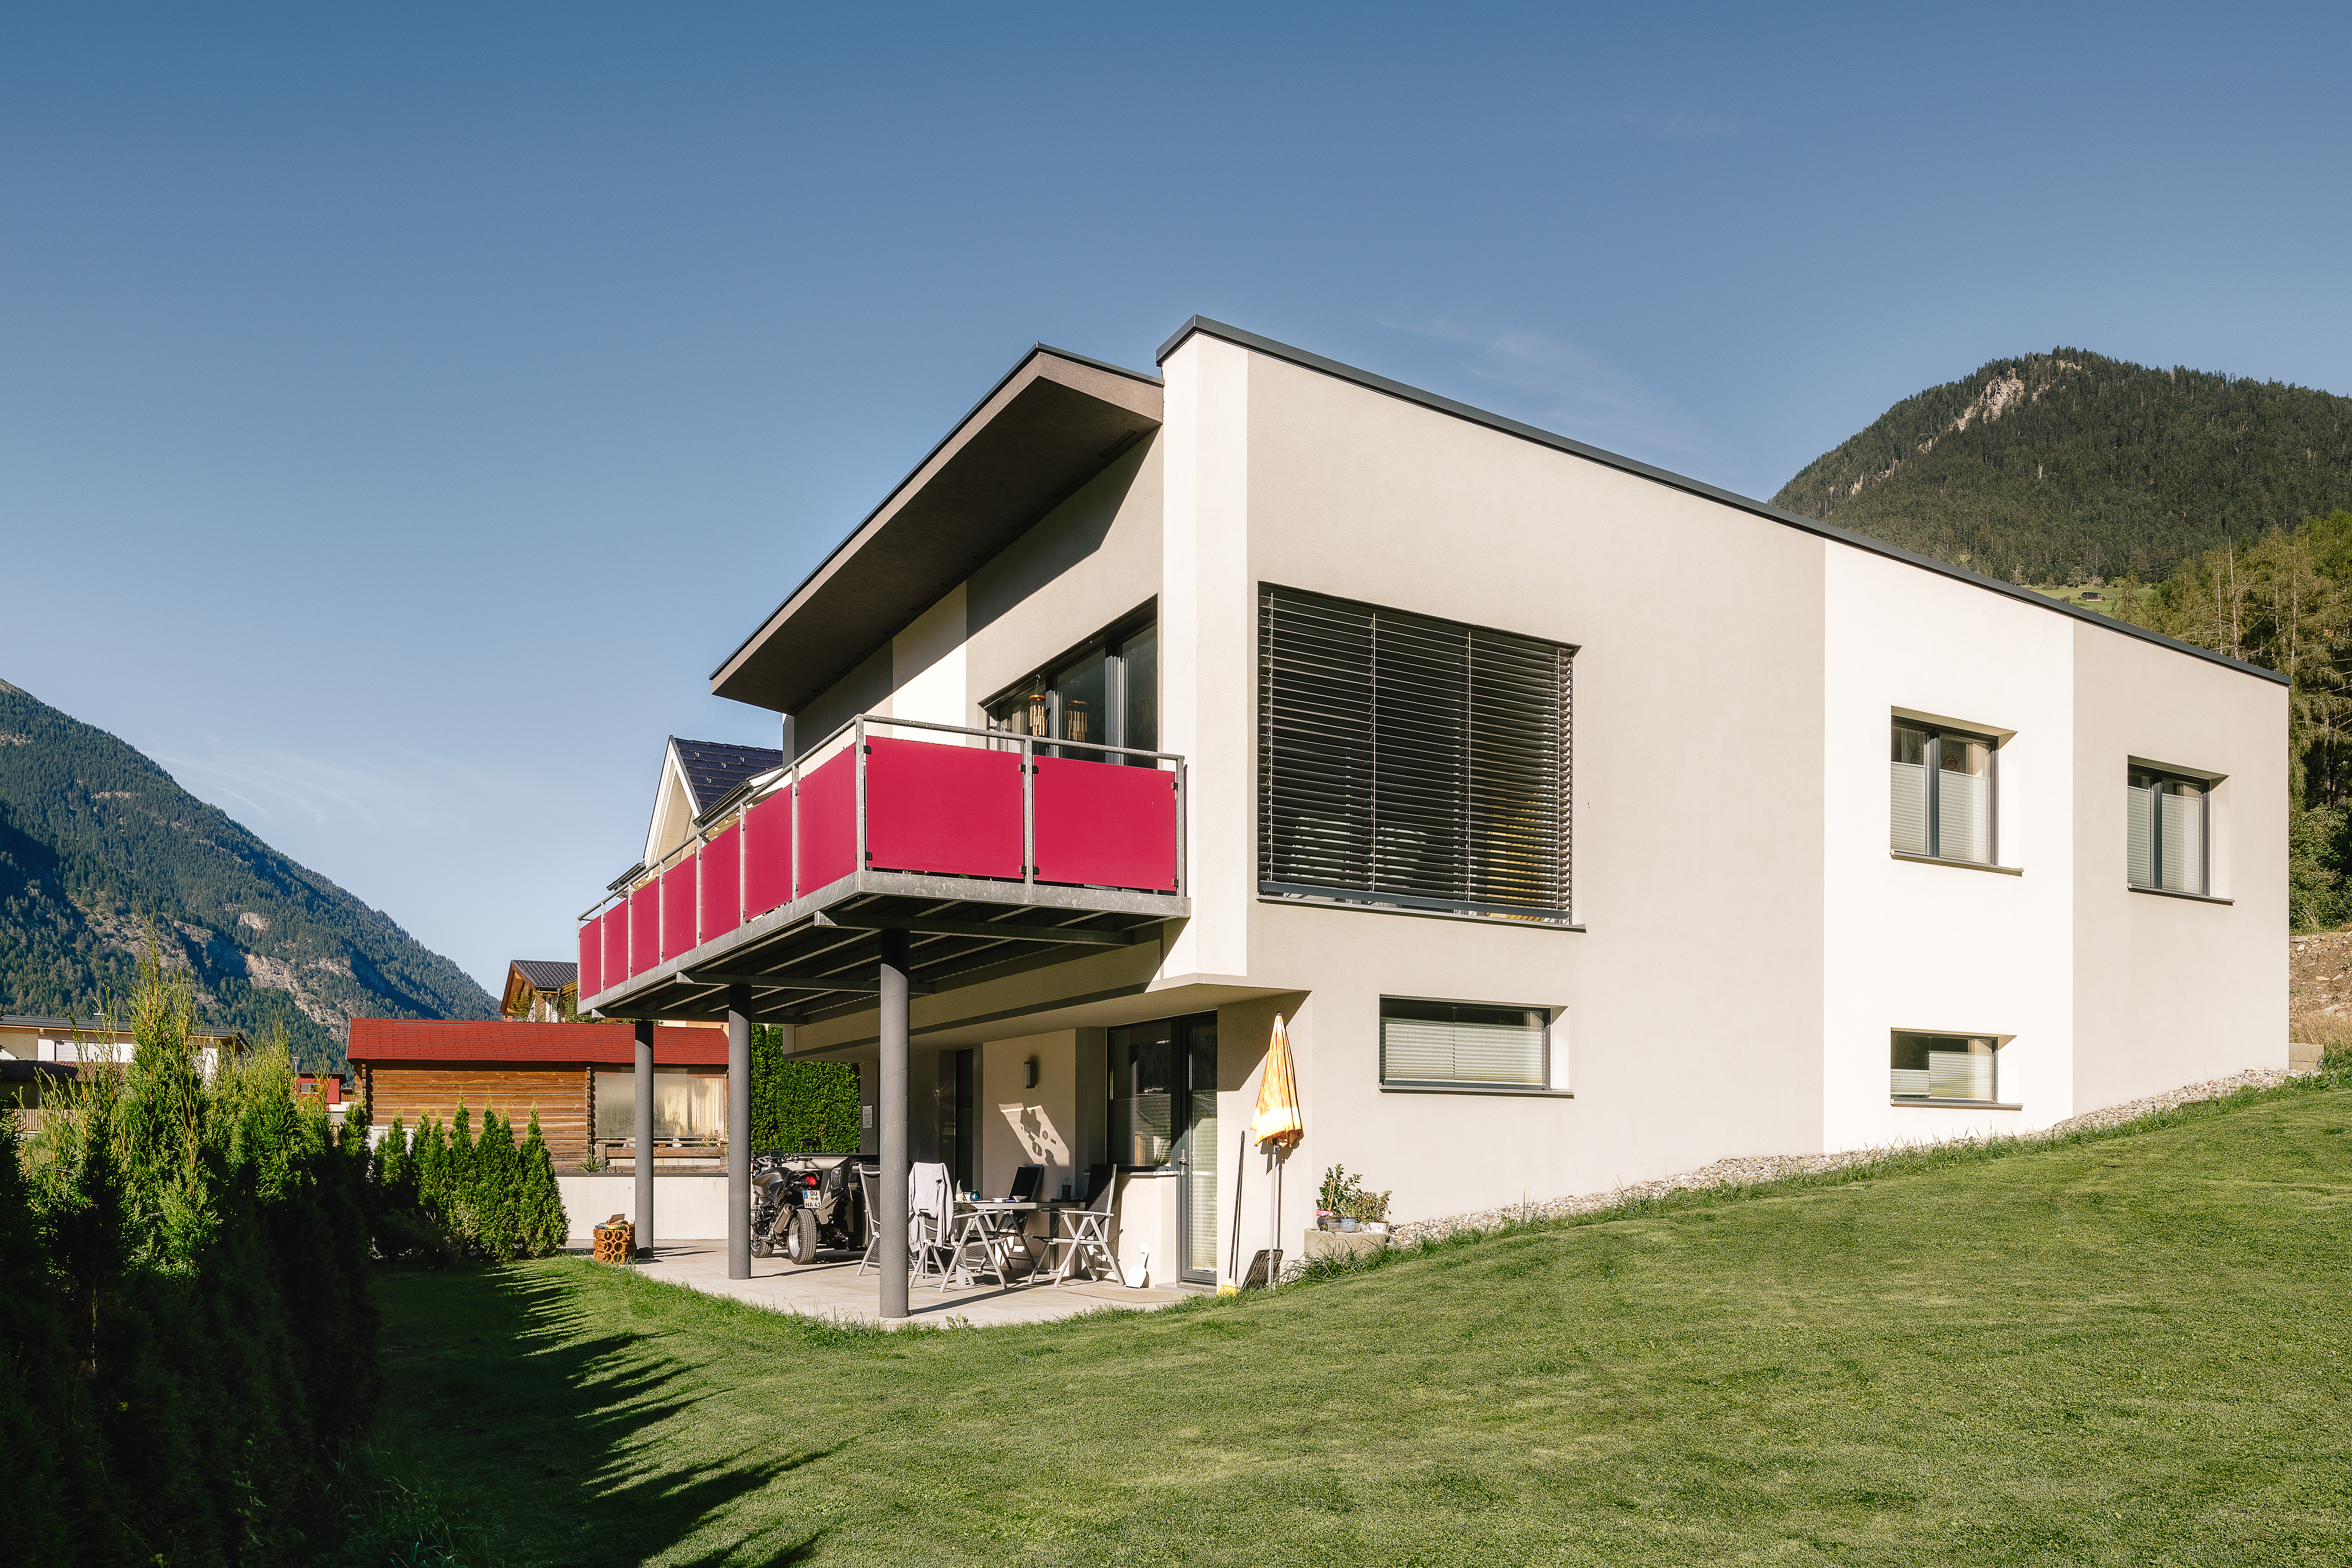 TVB-Tiroler-Oberland-Andreas-Schalber